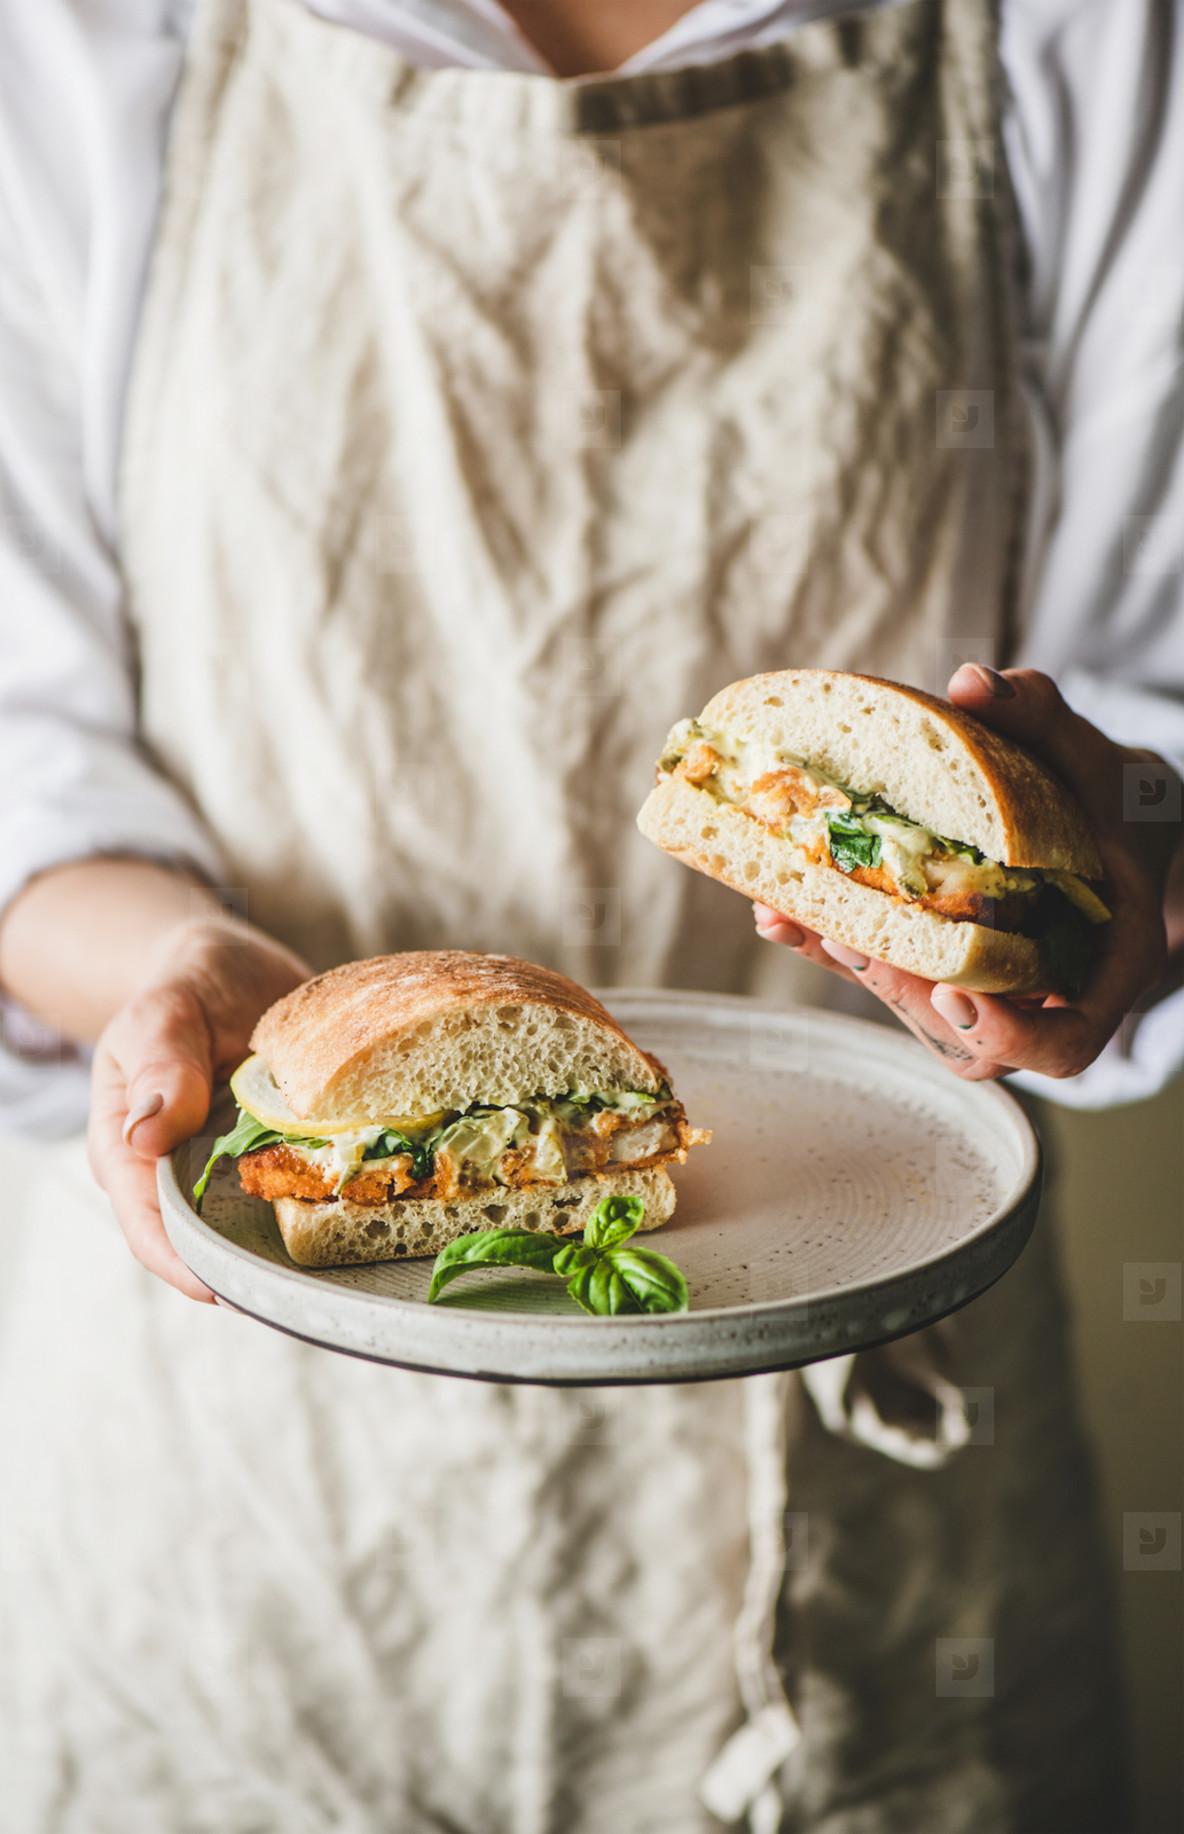 Woman holding fresh breakfast sandwich with fried fish  lemon  arugula